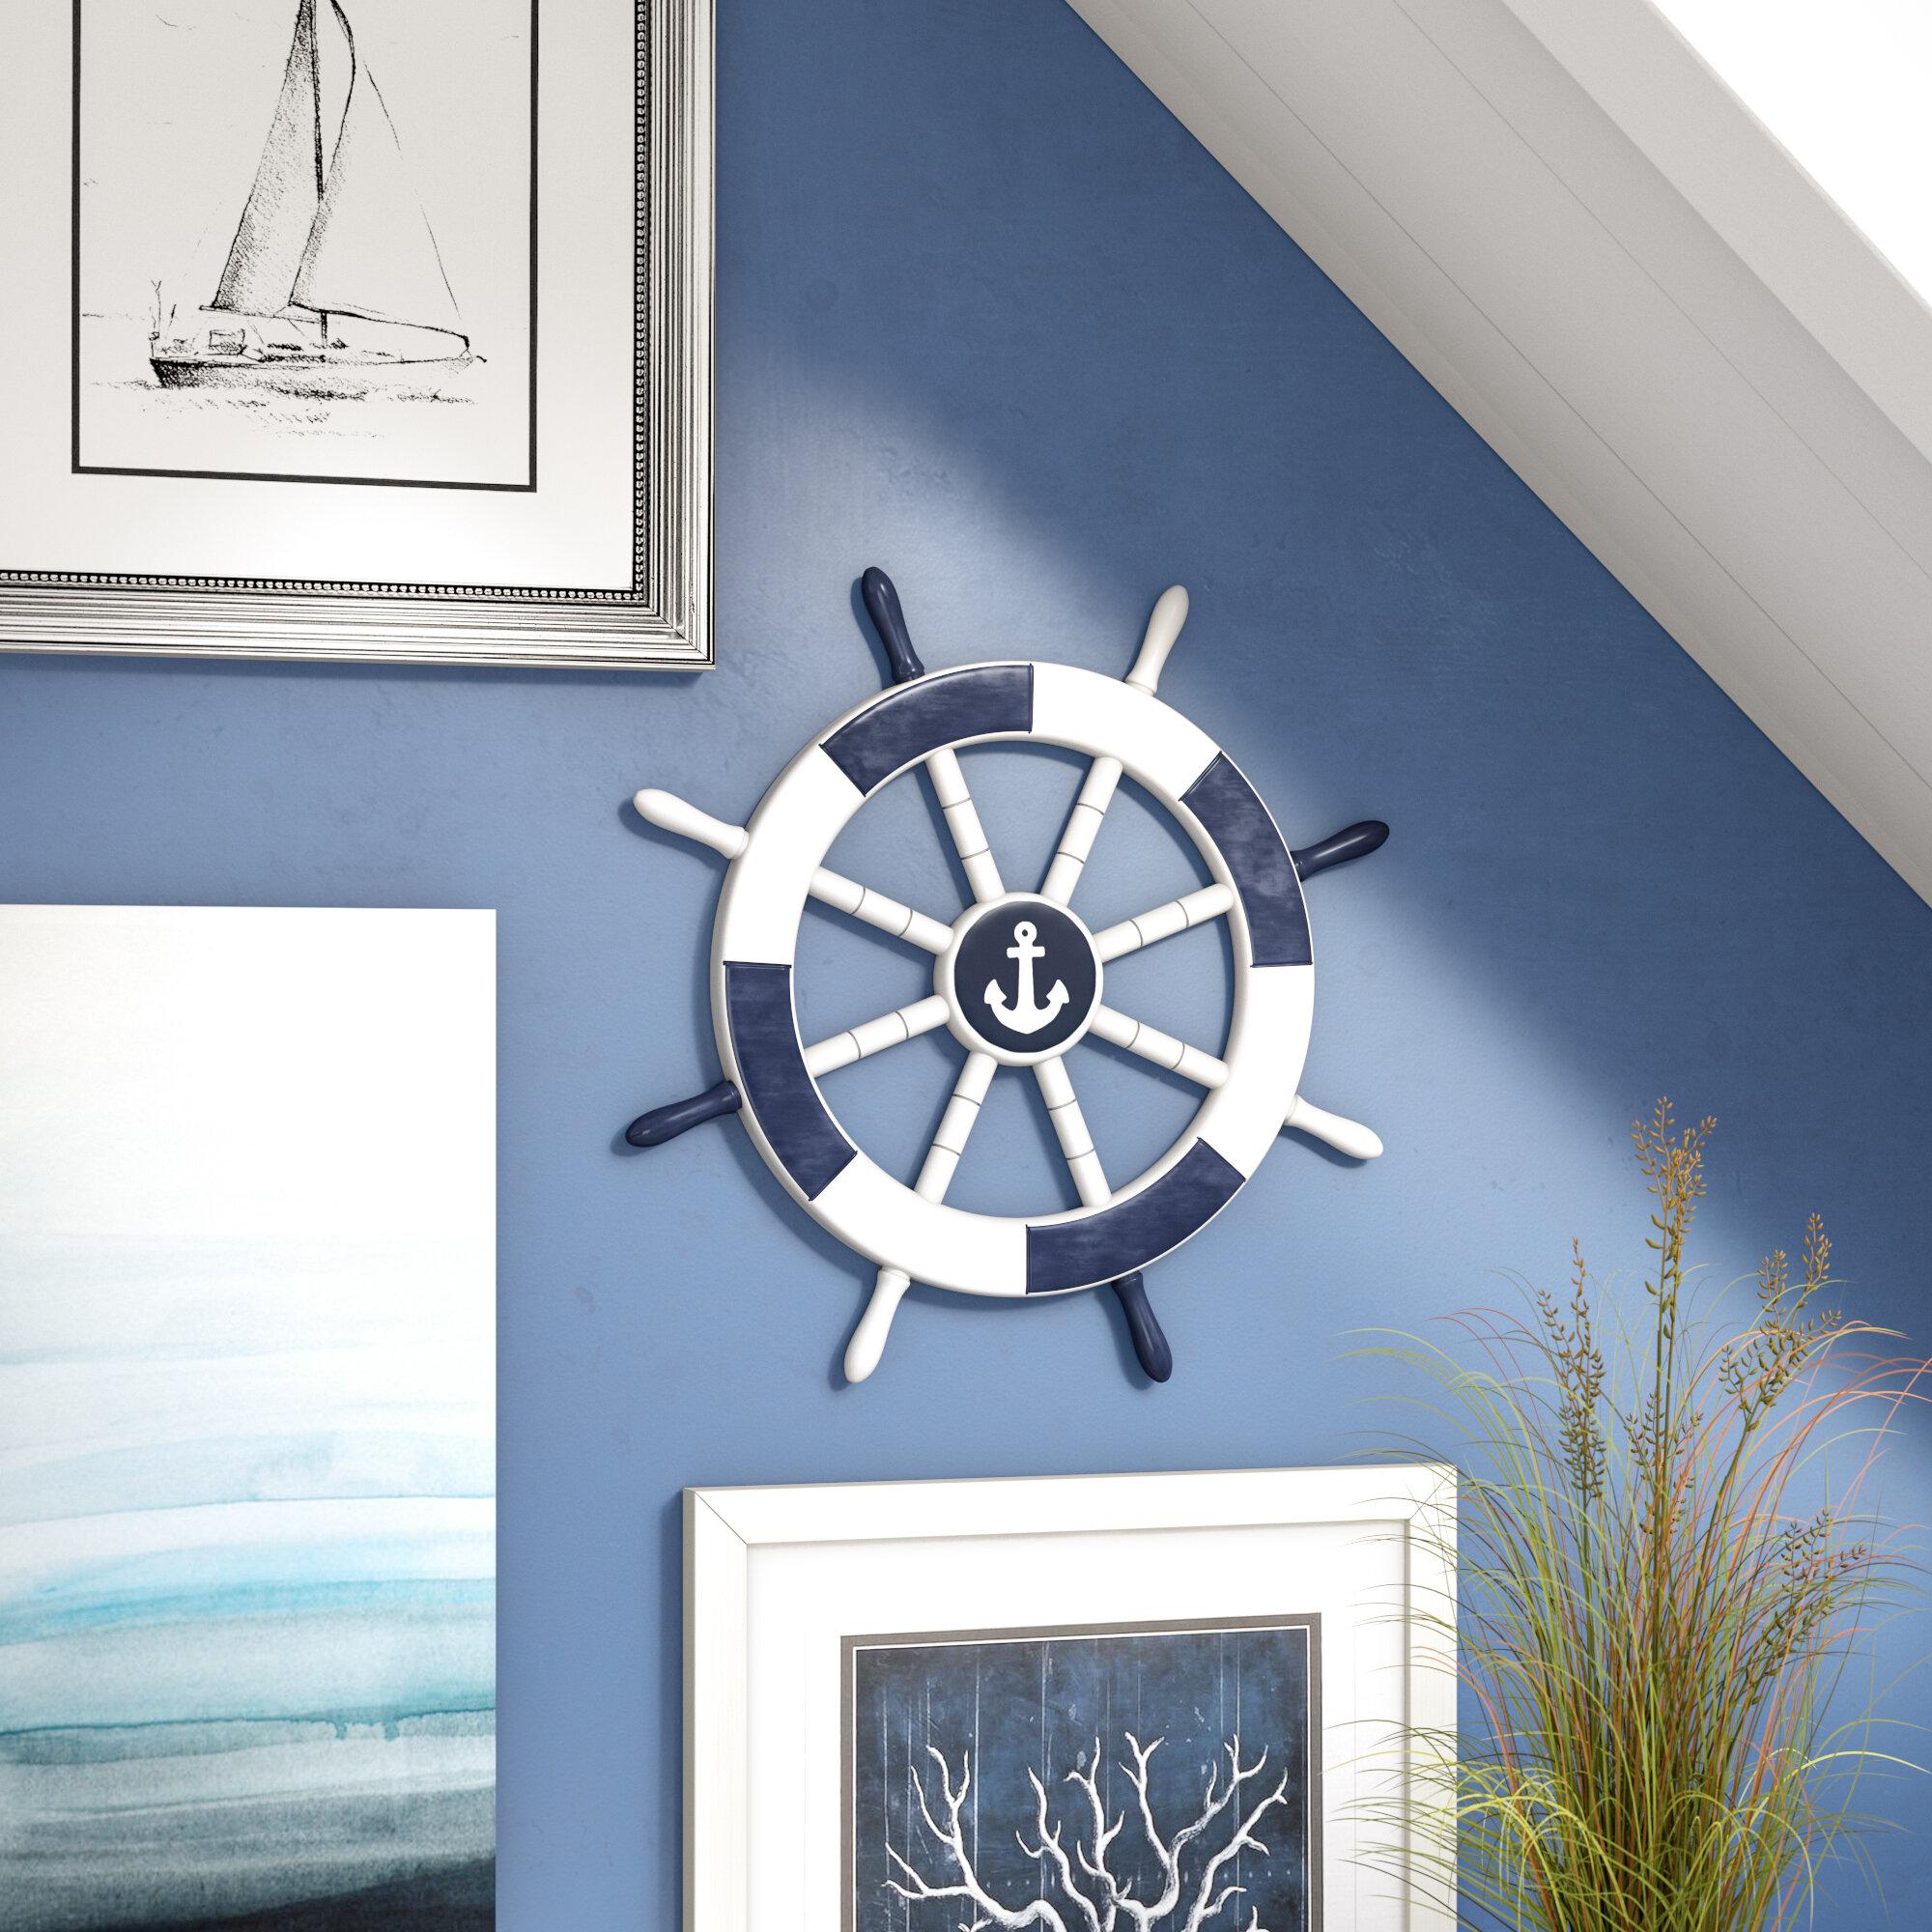 18 White Decorative Ship Wheel With Anchor Wall D Cor